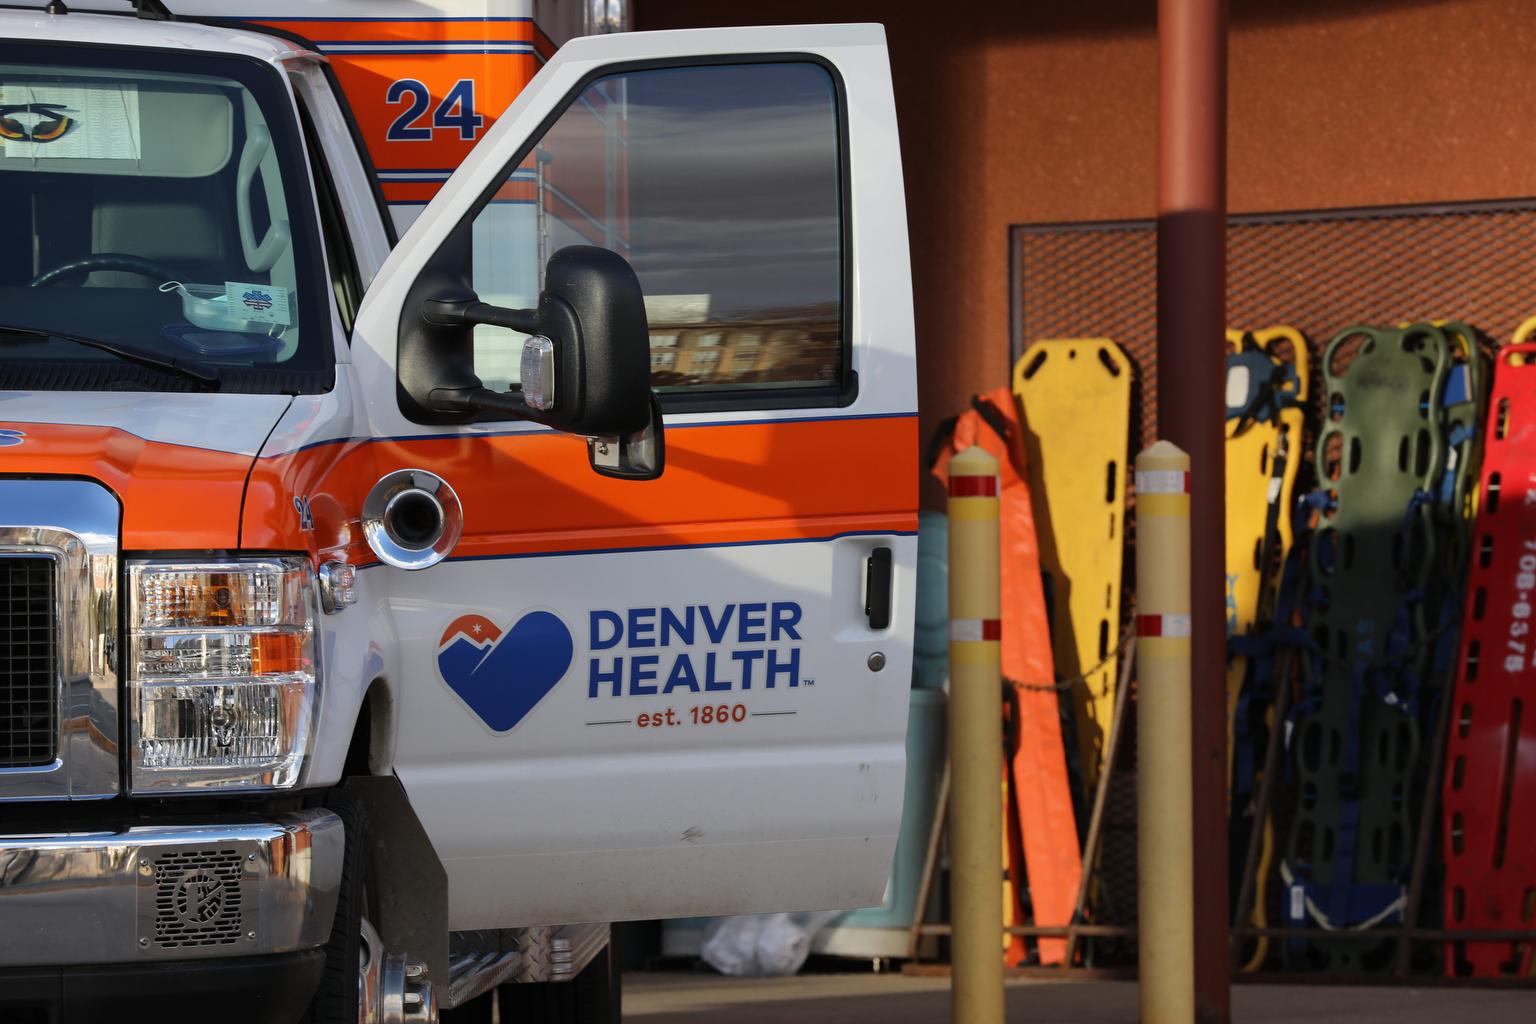 Denver Health Paramedics ambulance at Denver Health on Speer Boulevard.